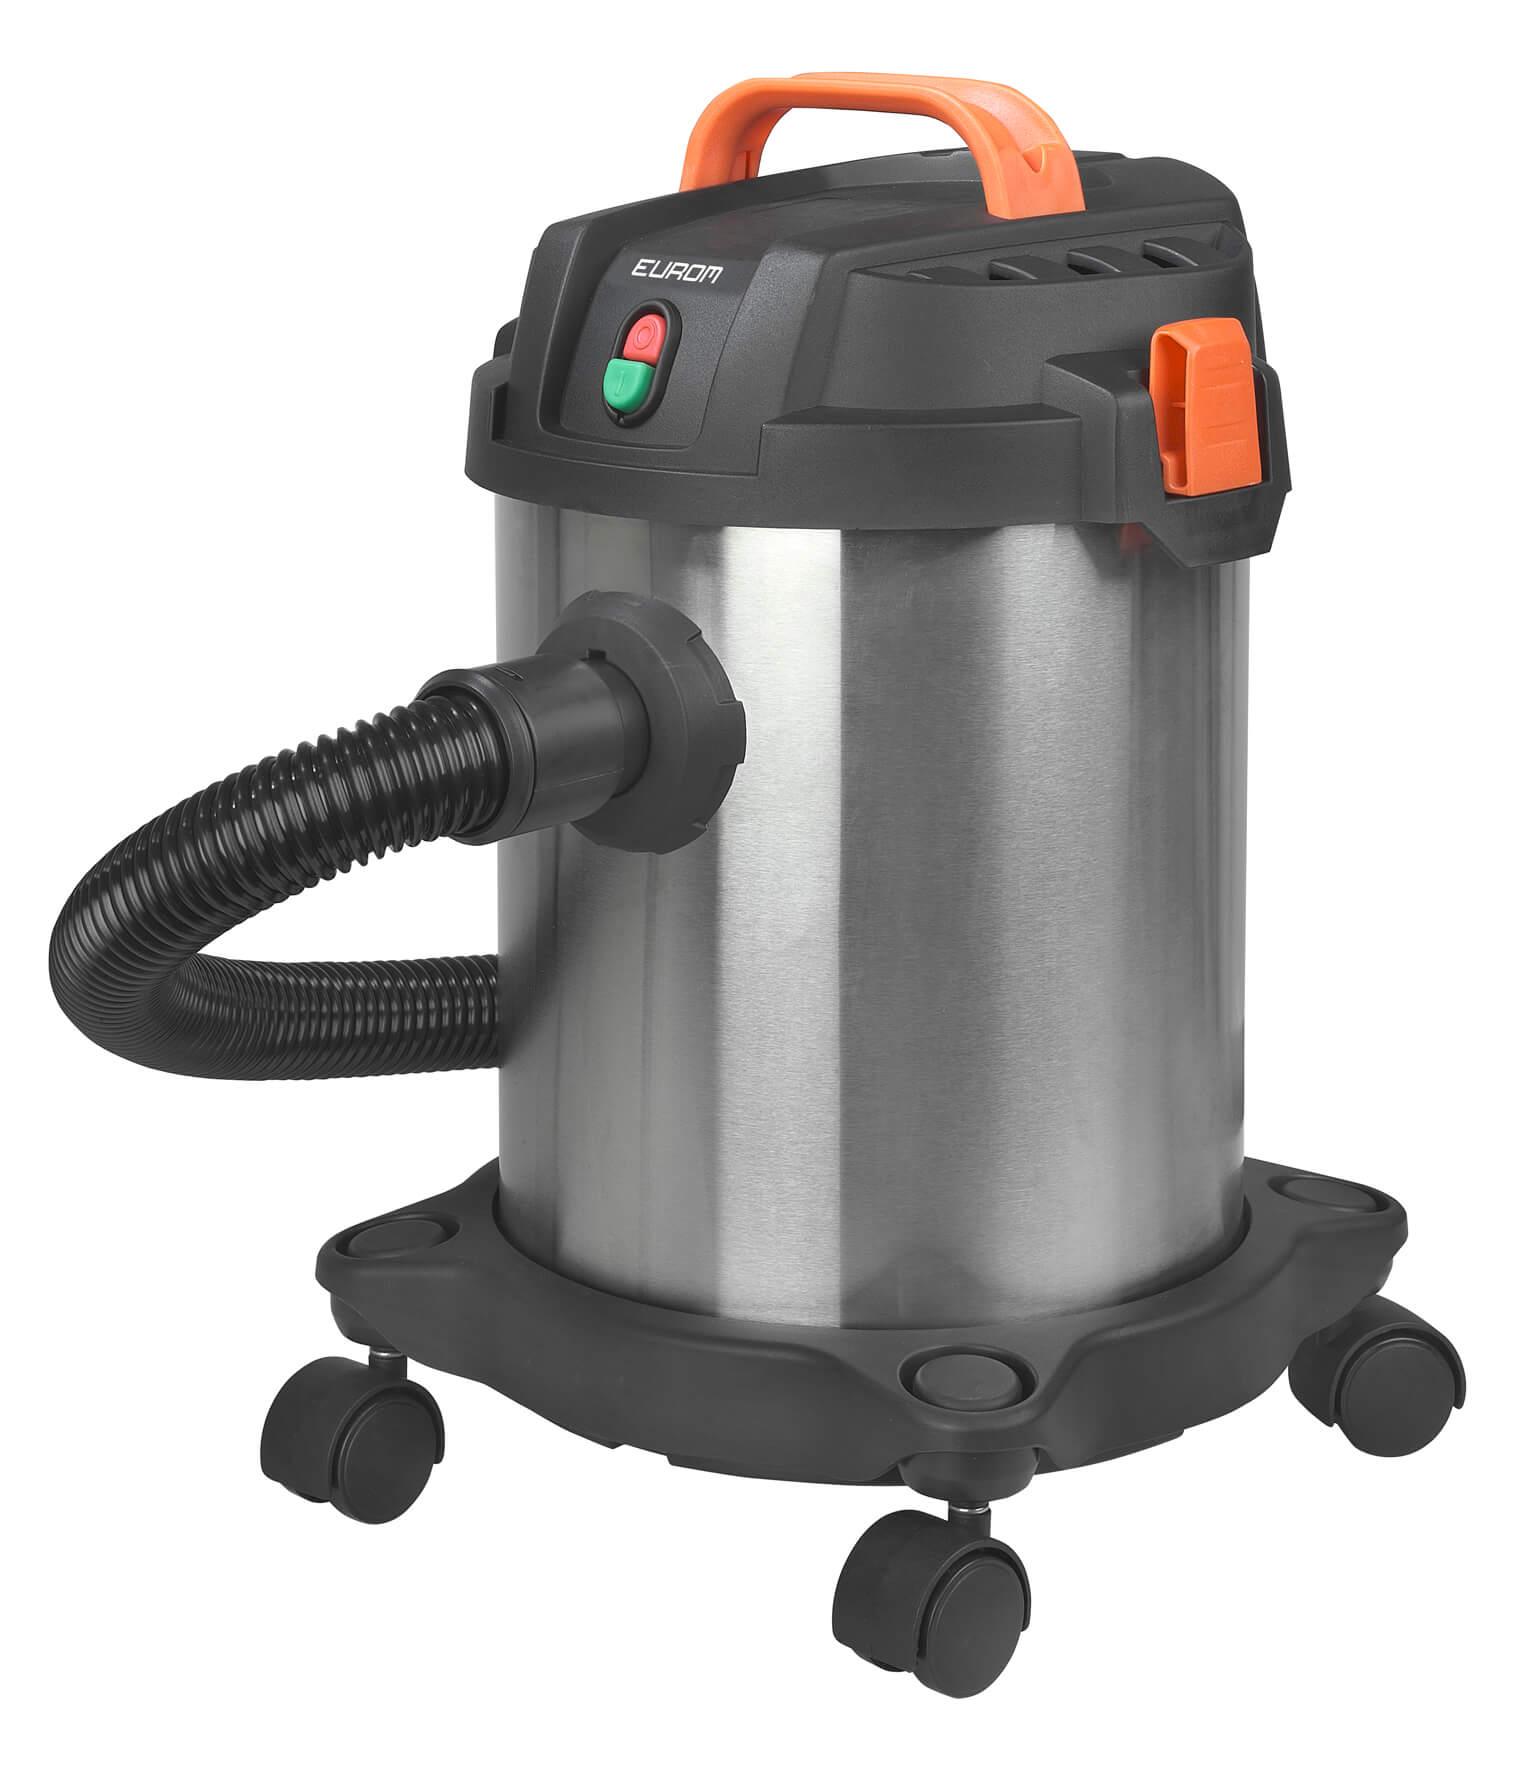 Eurom Force 1012 Alleszuiger 1000W | Stof en waterzuiger met 12 liter ketel